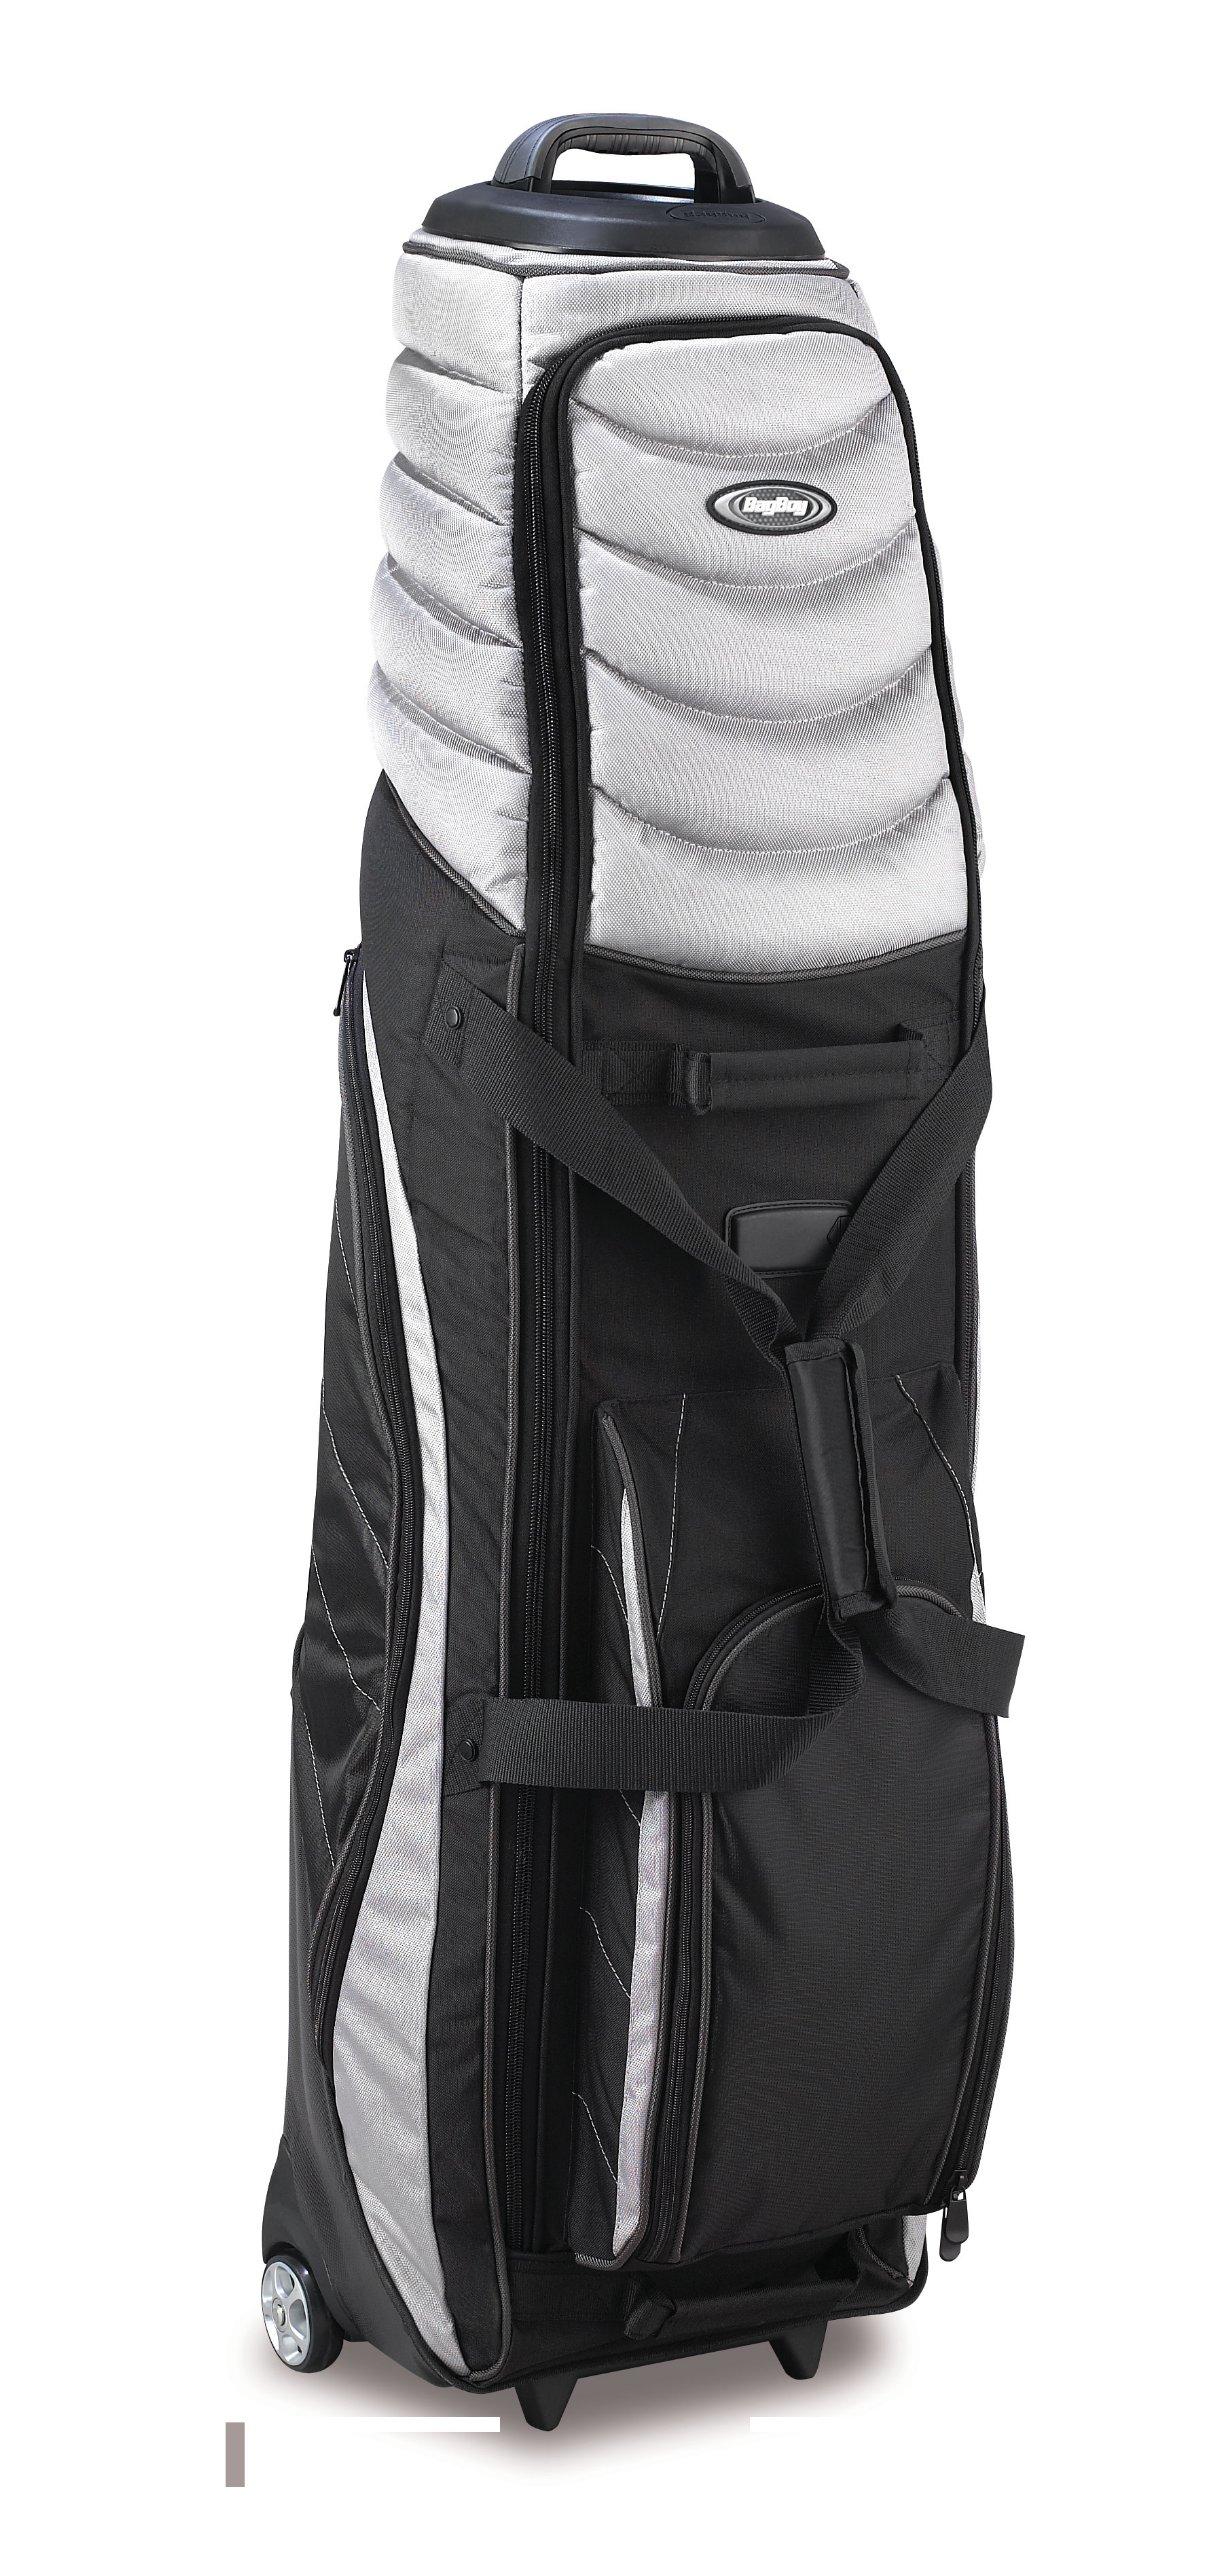 Bag Boy T-2000 Pivot Grip Wheeled Travel Cover, Silver/Black